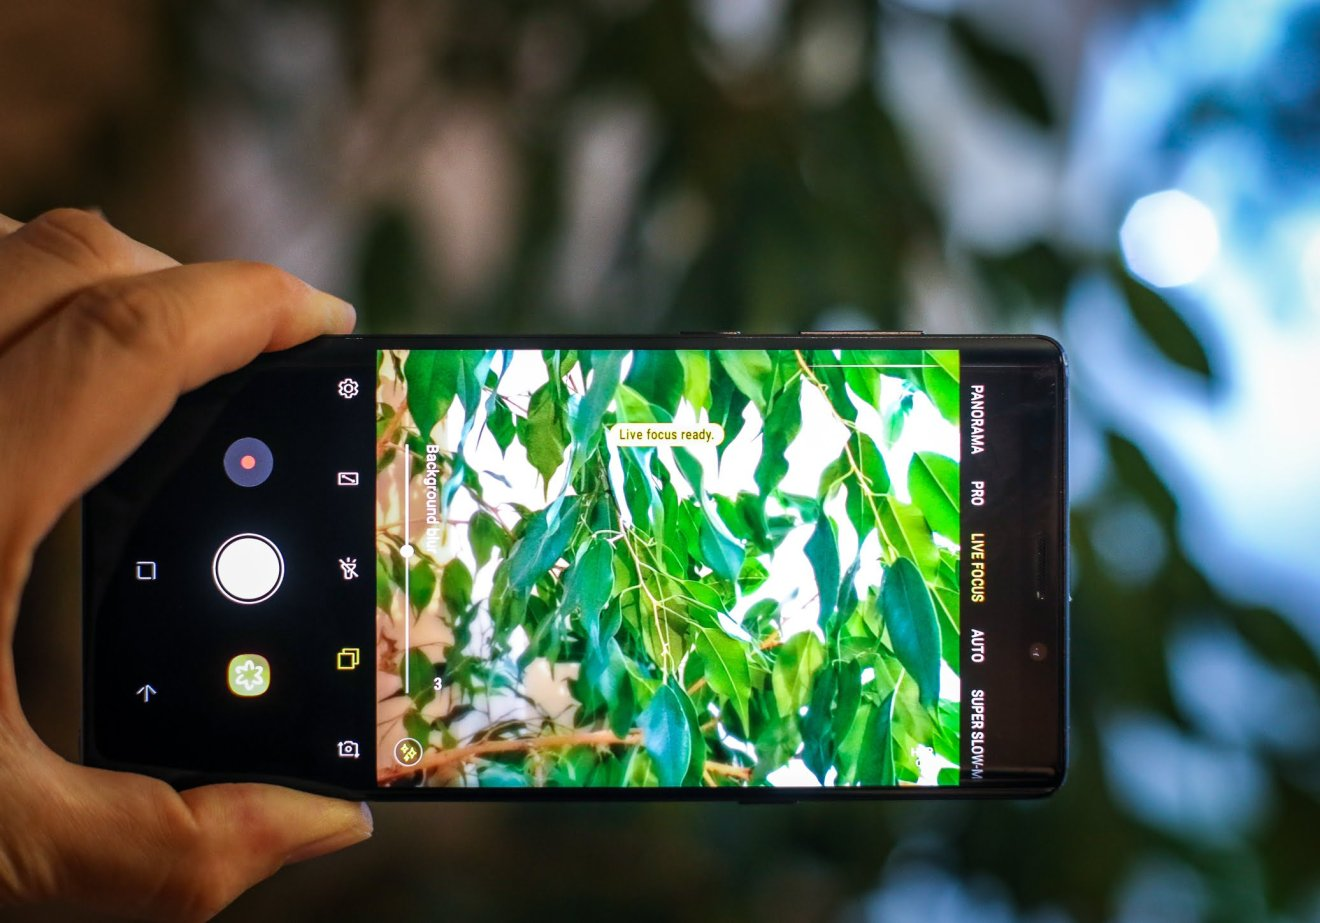 Samsung Galaxy Note 9 - Live Focus mode